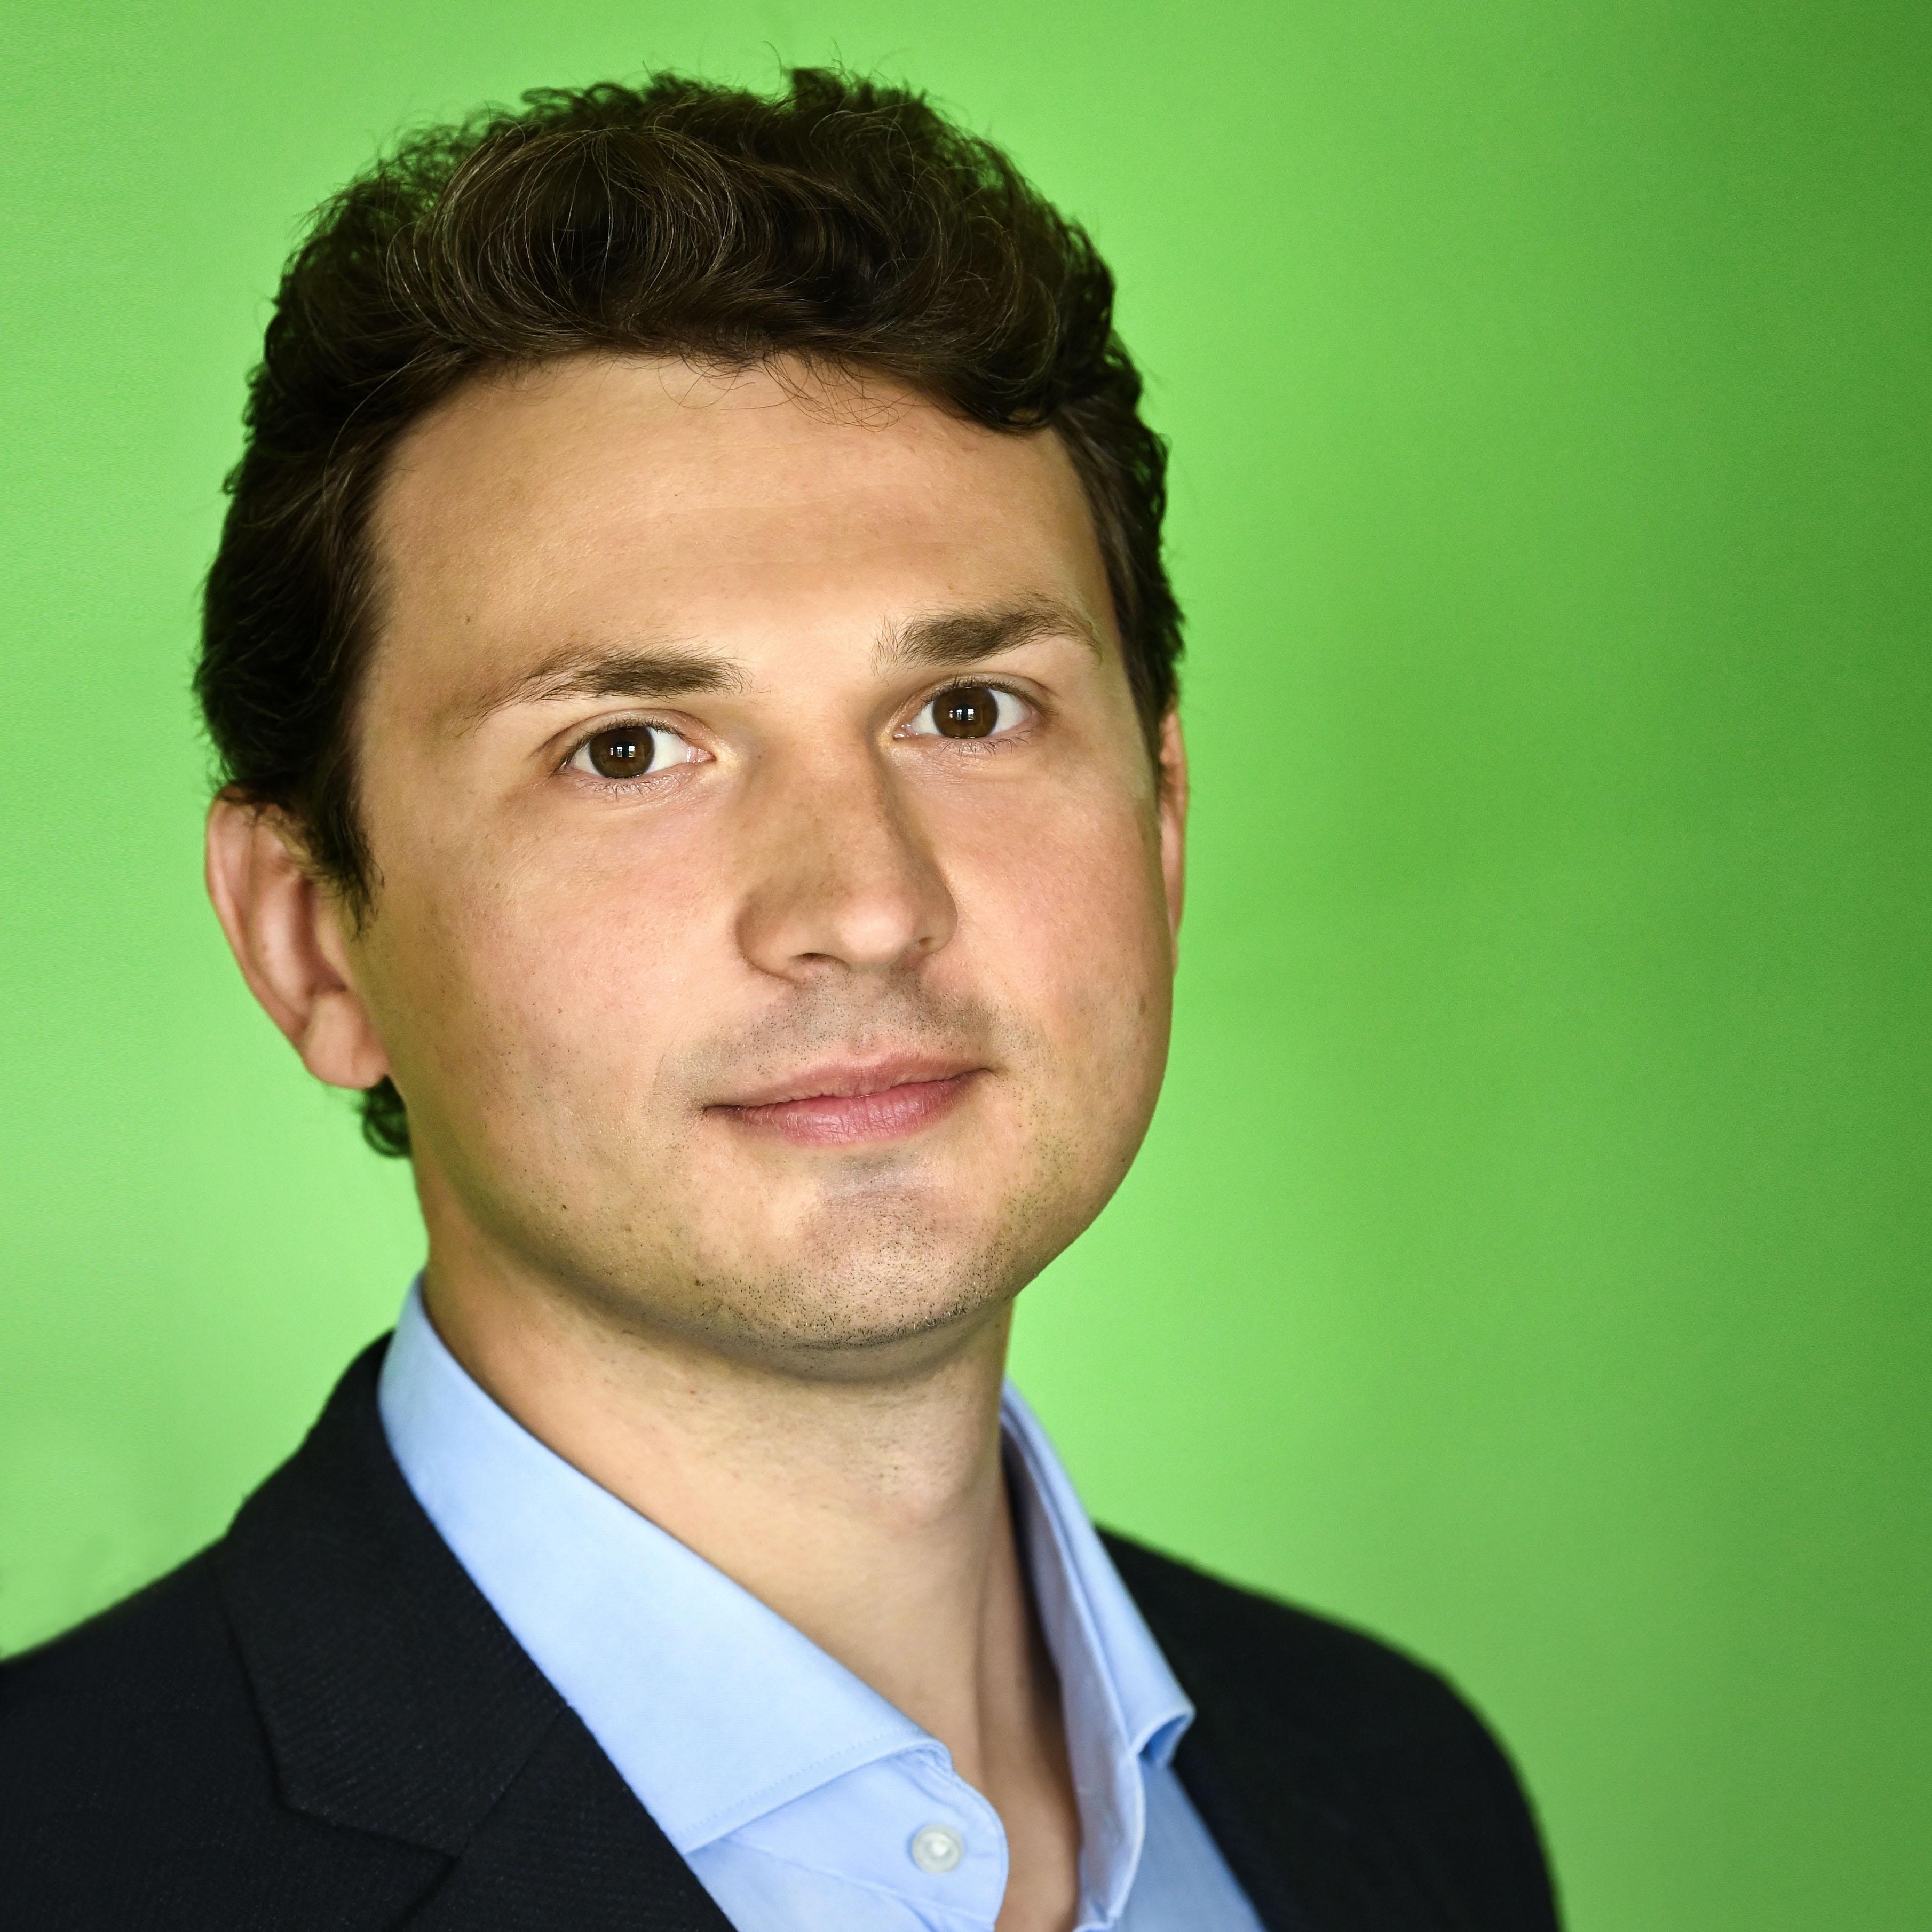 Alexey Sayapin (Sänger)